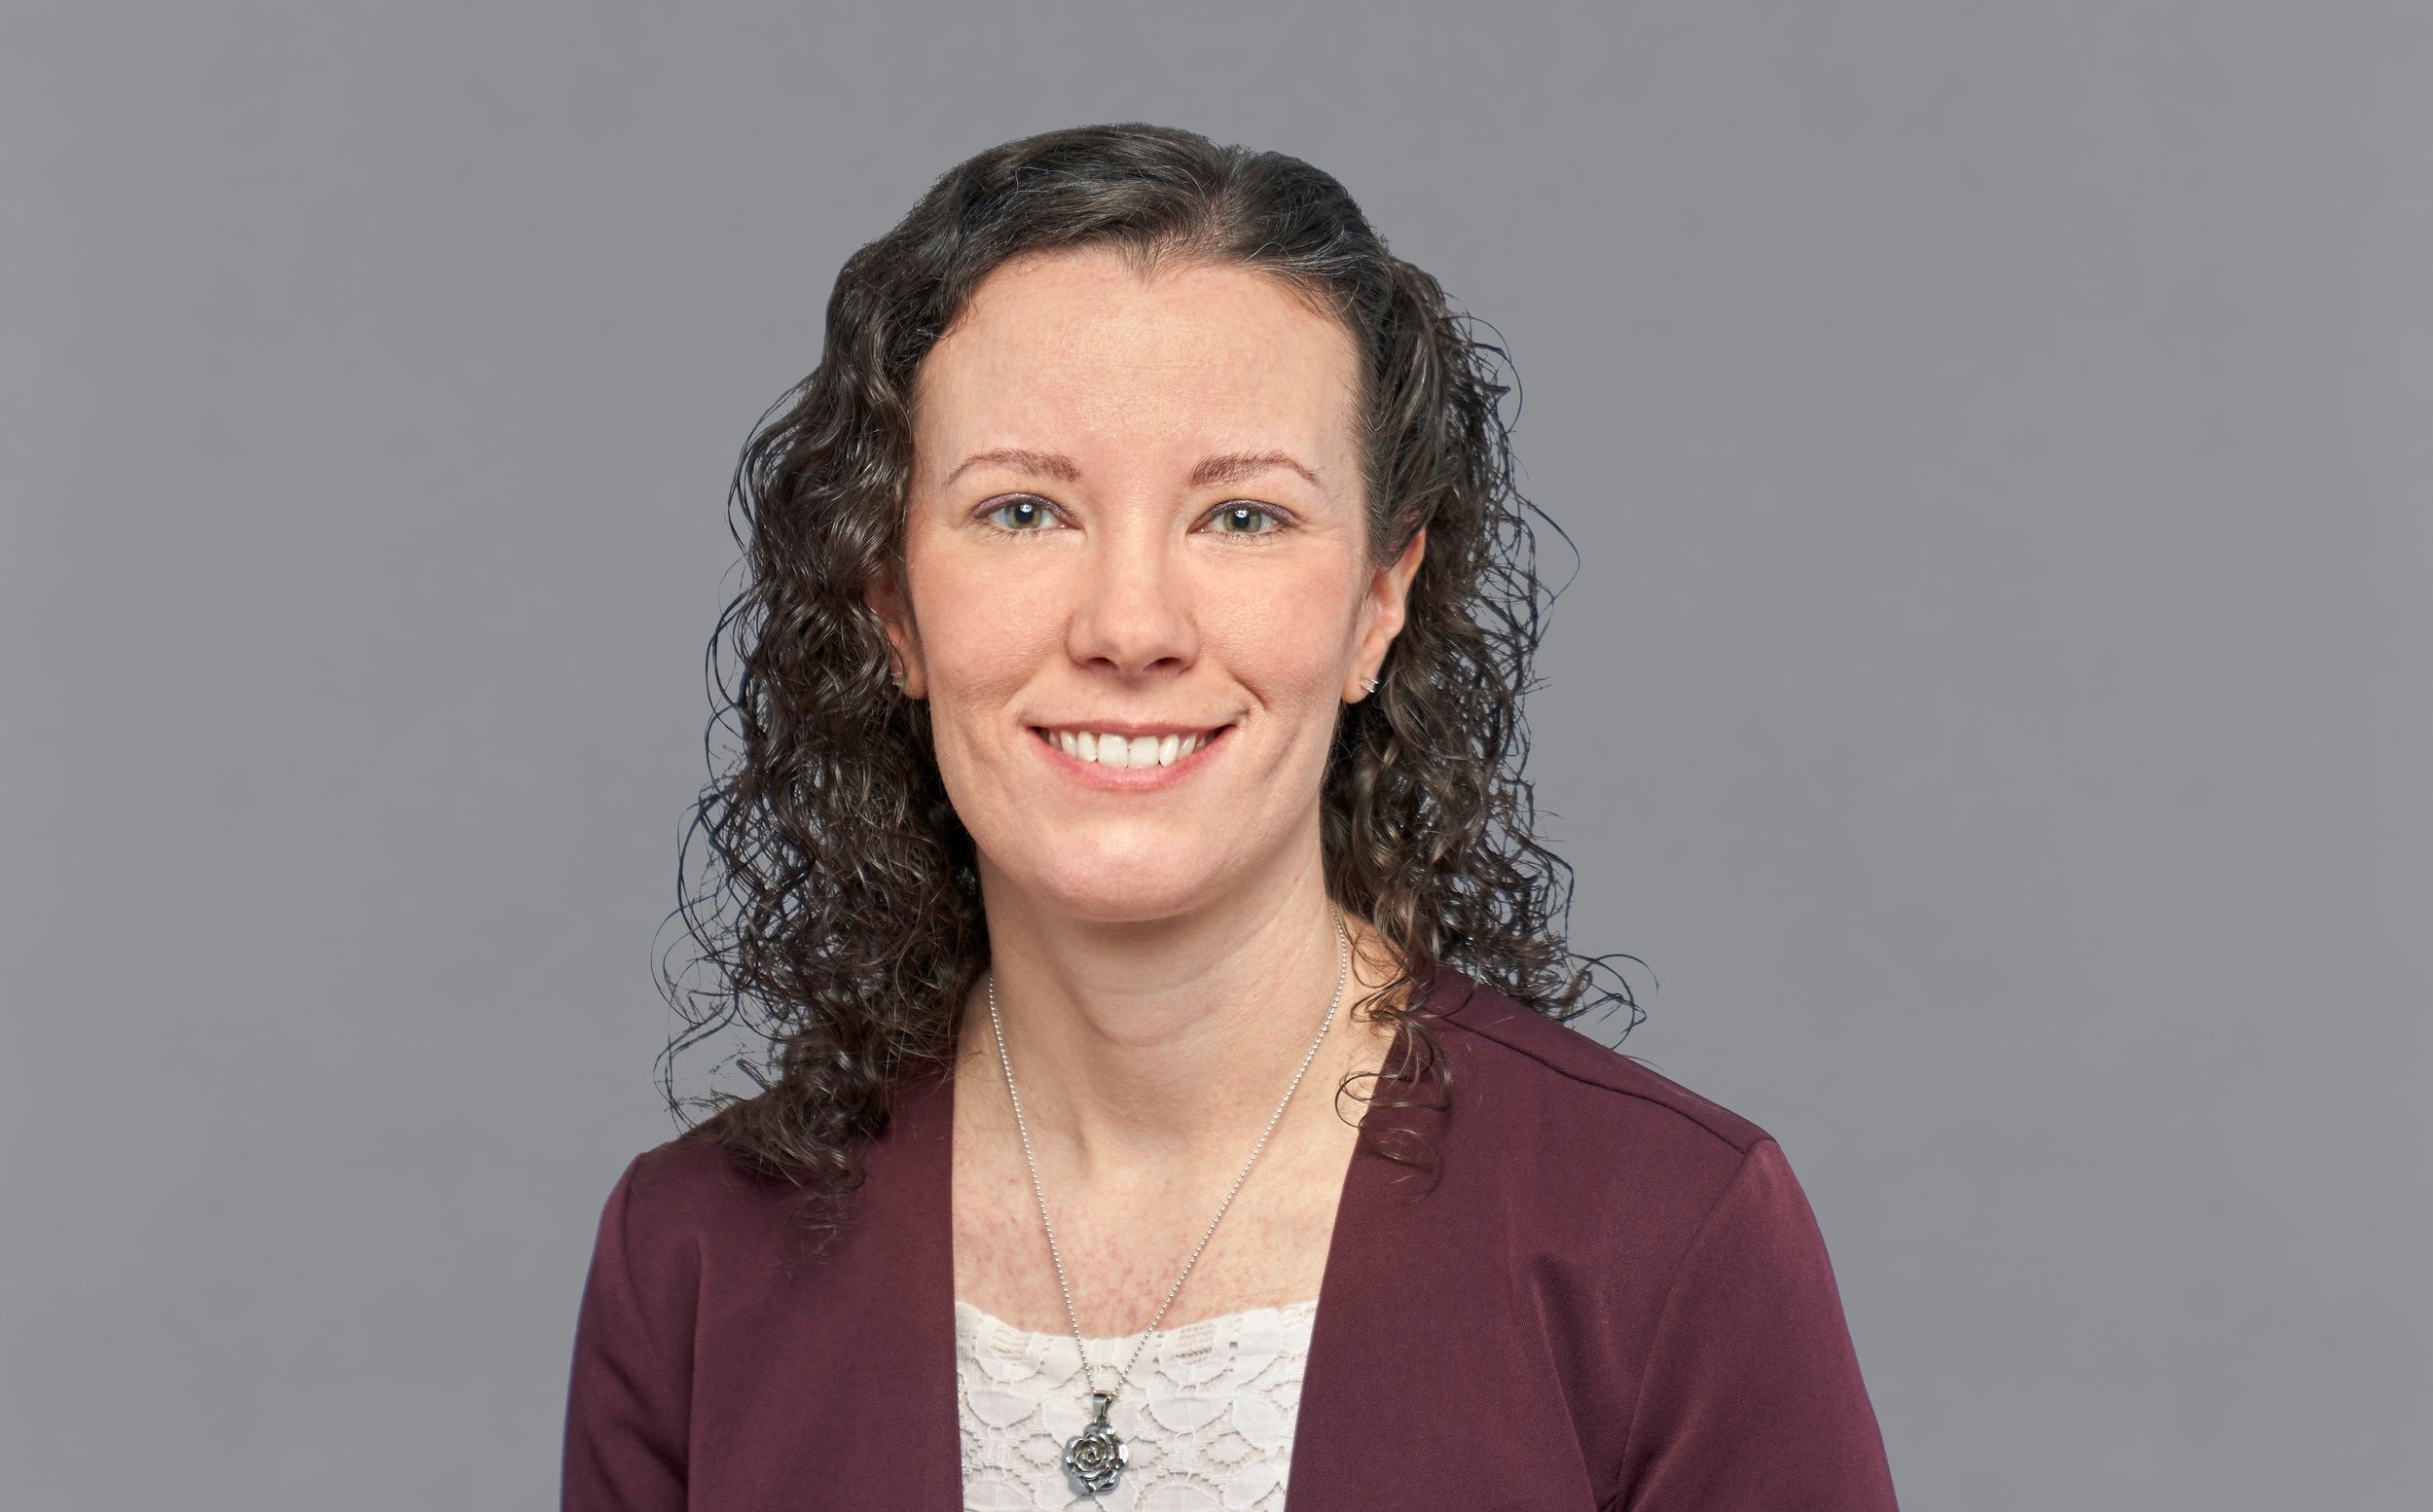 Jessica Kavanagh, RA, LEED BD+C, WELL AP Principal